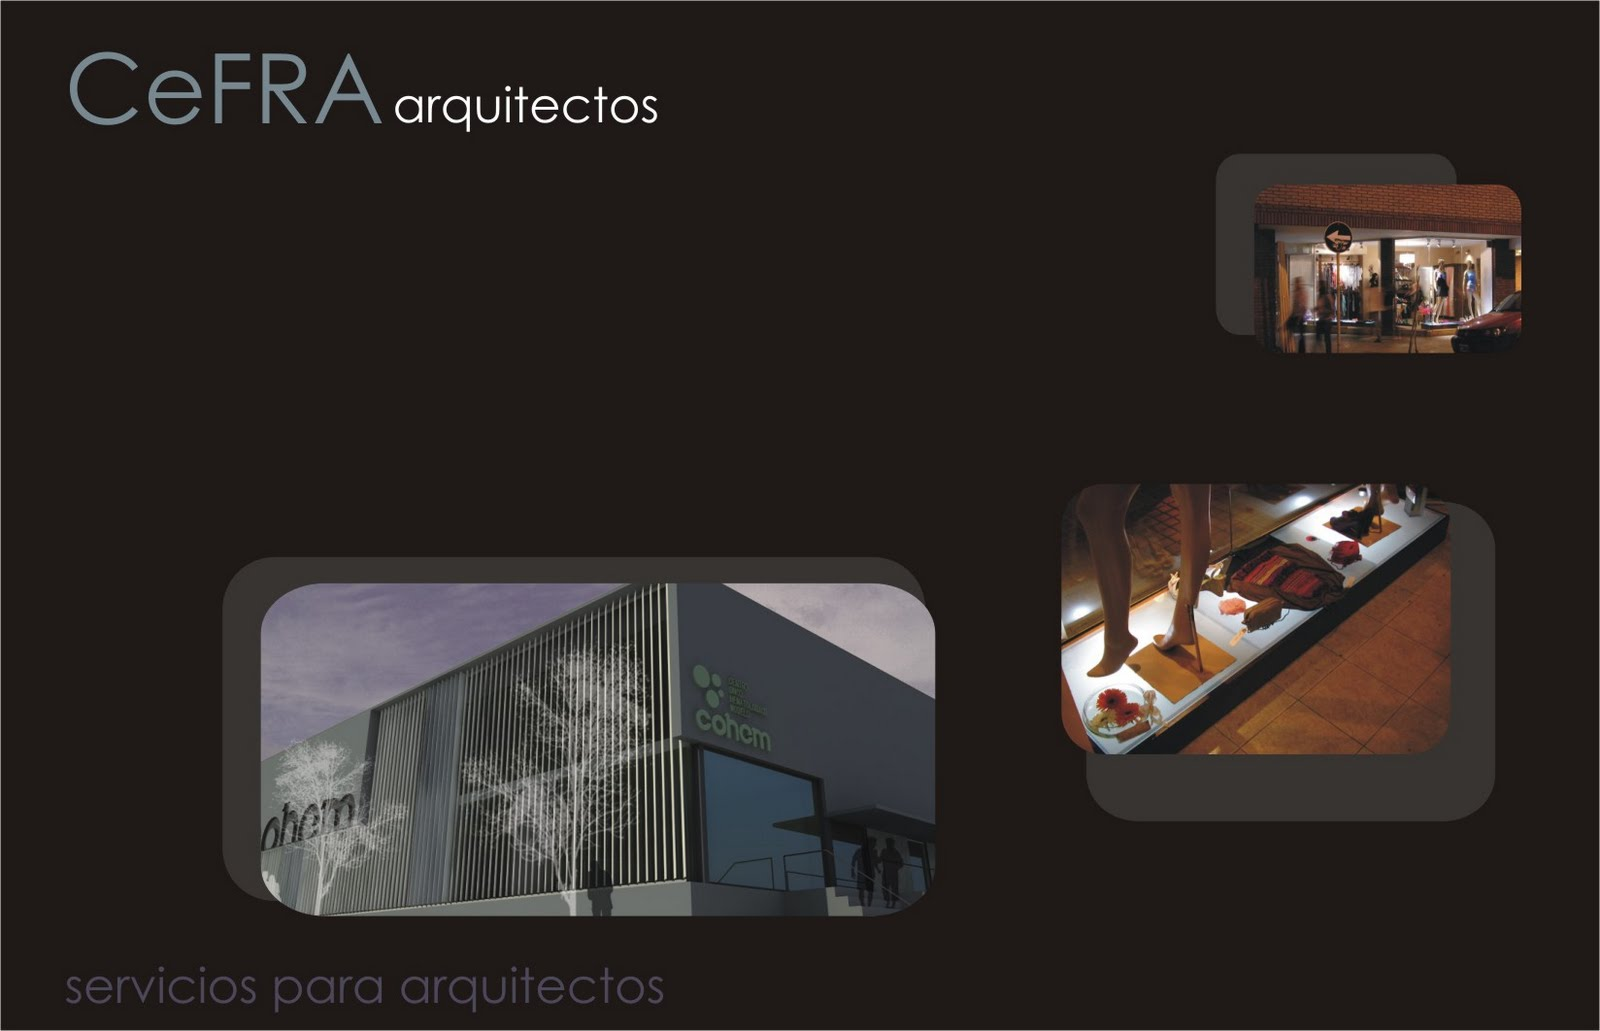 Cefra arquitectos servicios de arquitectura para arquitectos - Servicios de arquitectura ...